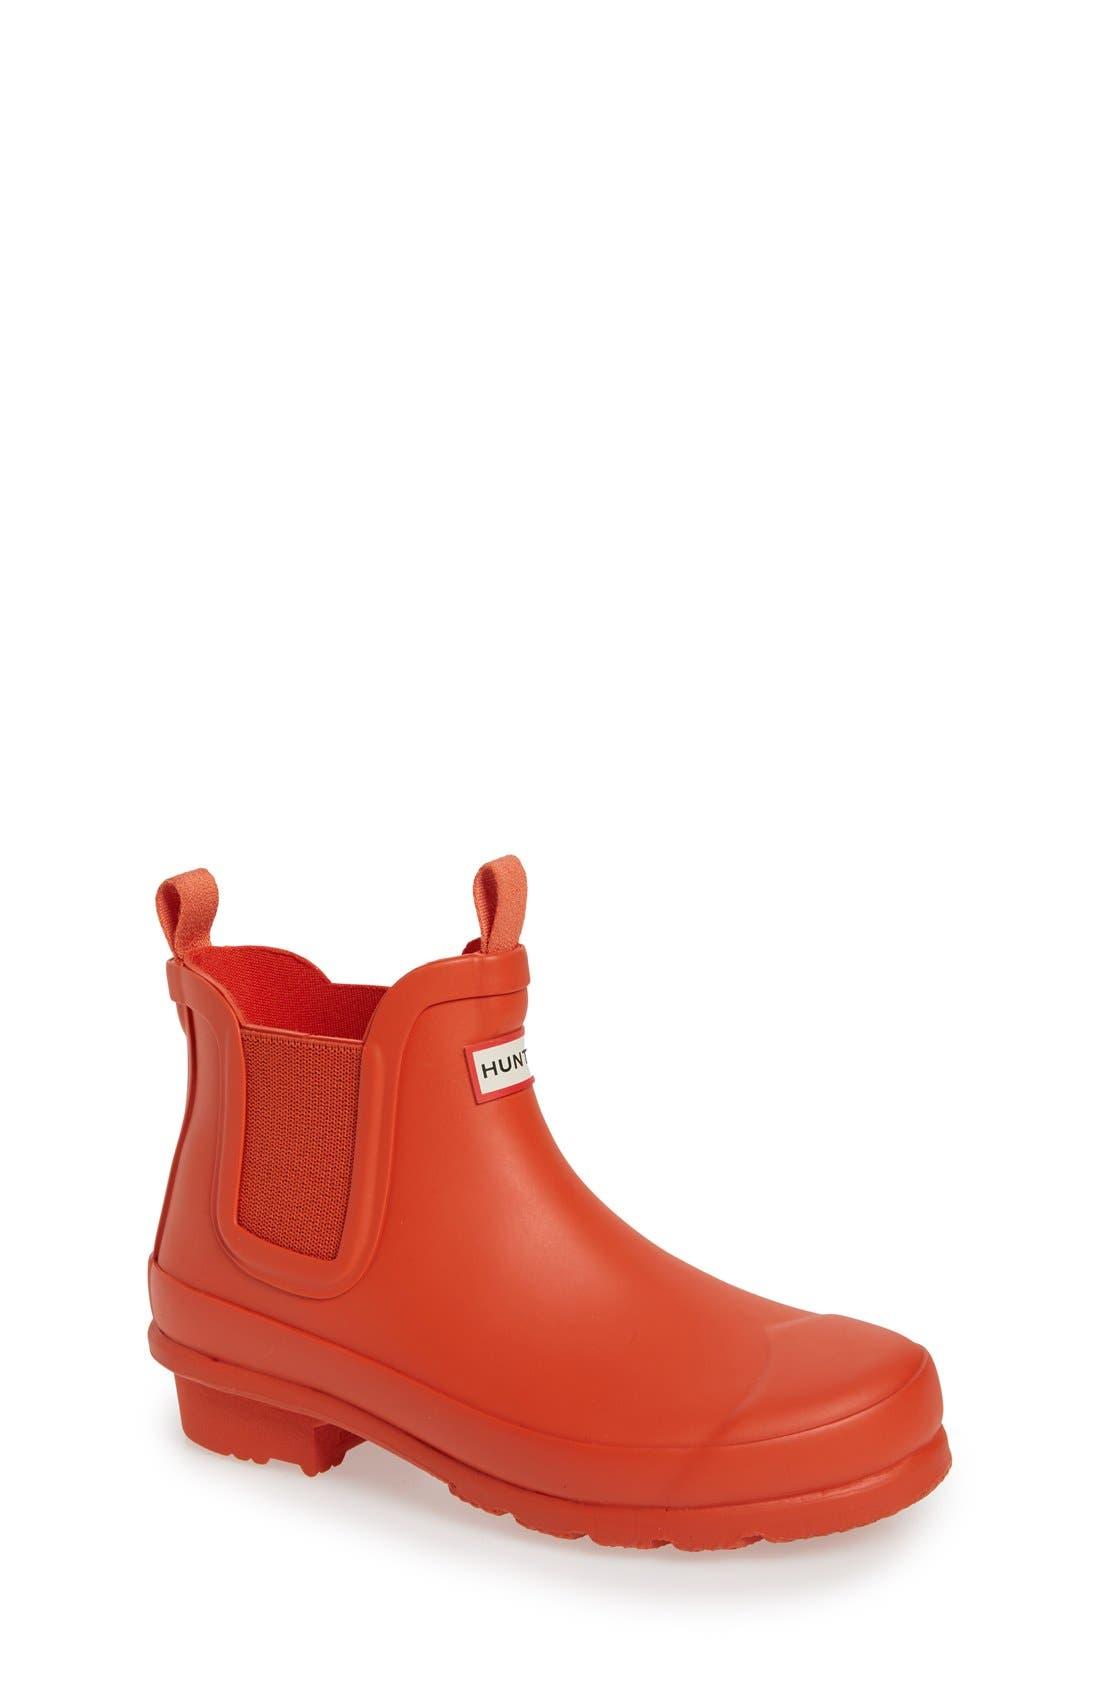 Alternate Image 1 Selected - Hunter 'Original' Chelsea Rain Boot (Toddler, Little Kid & Big Kid)